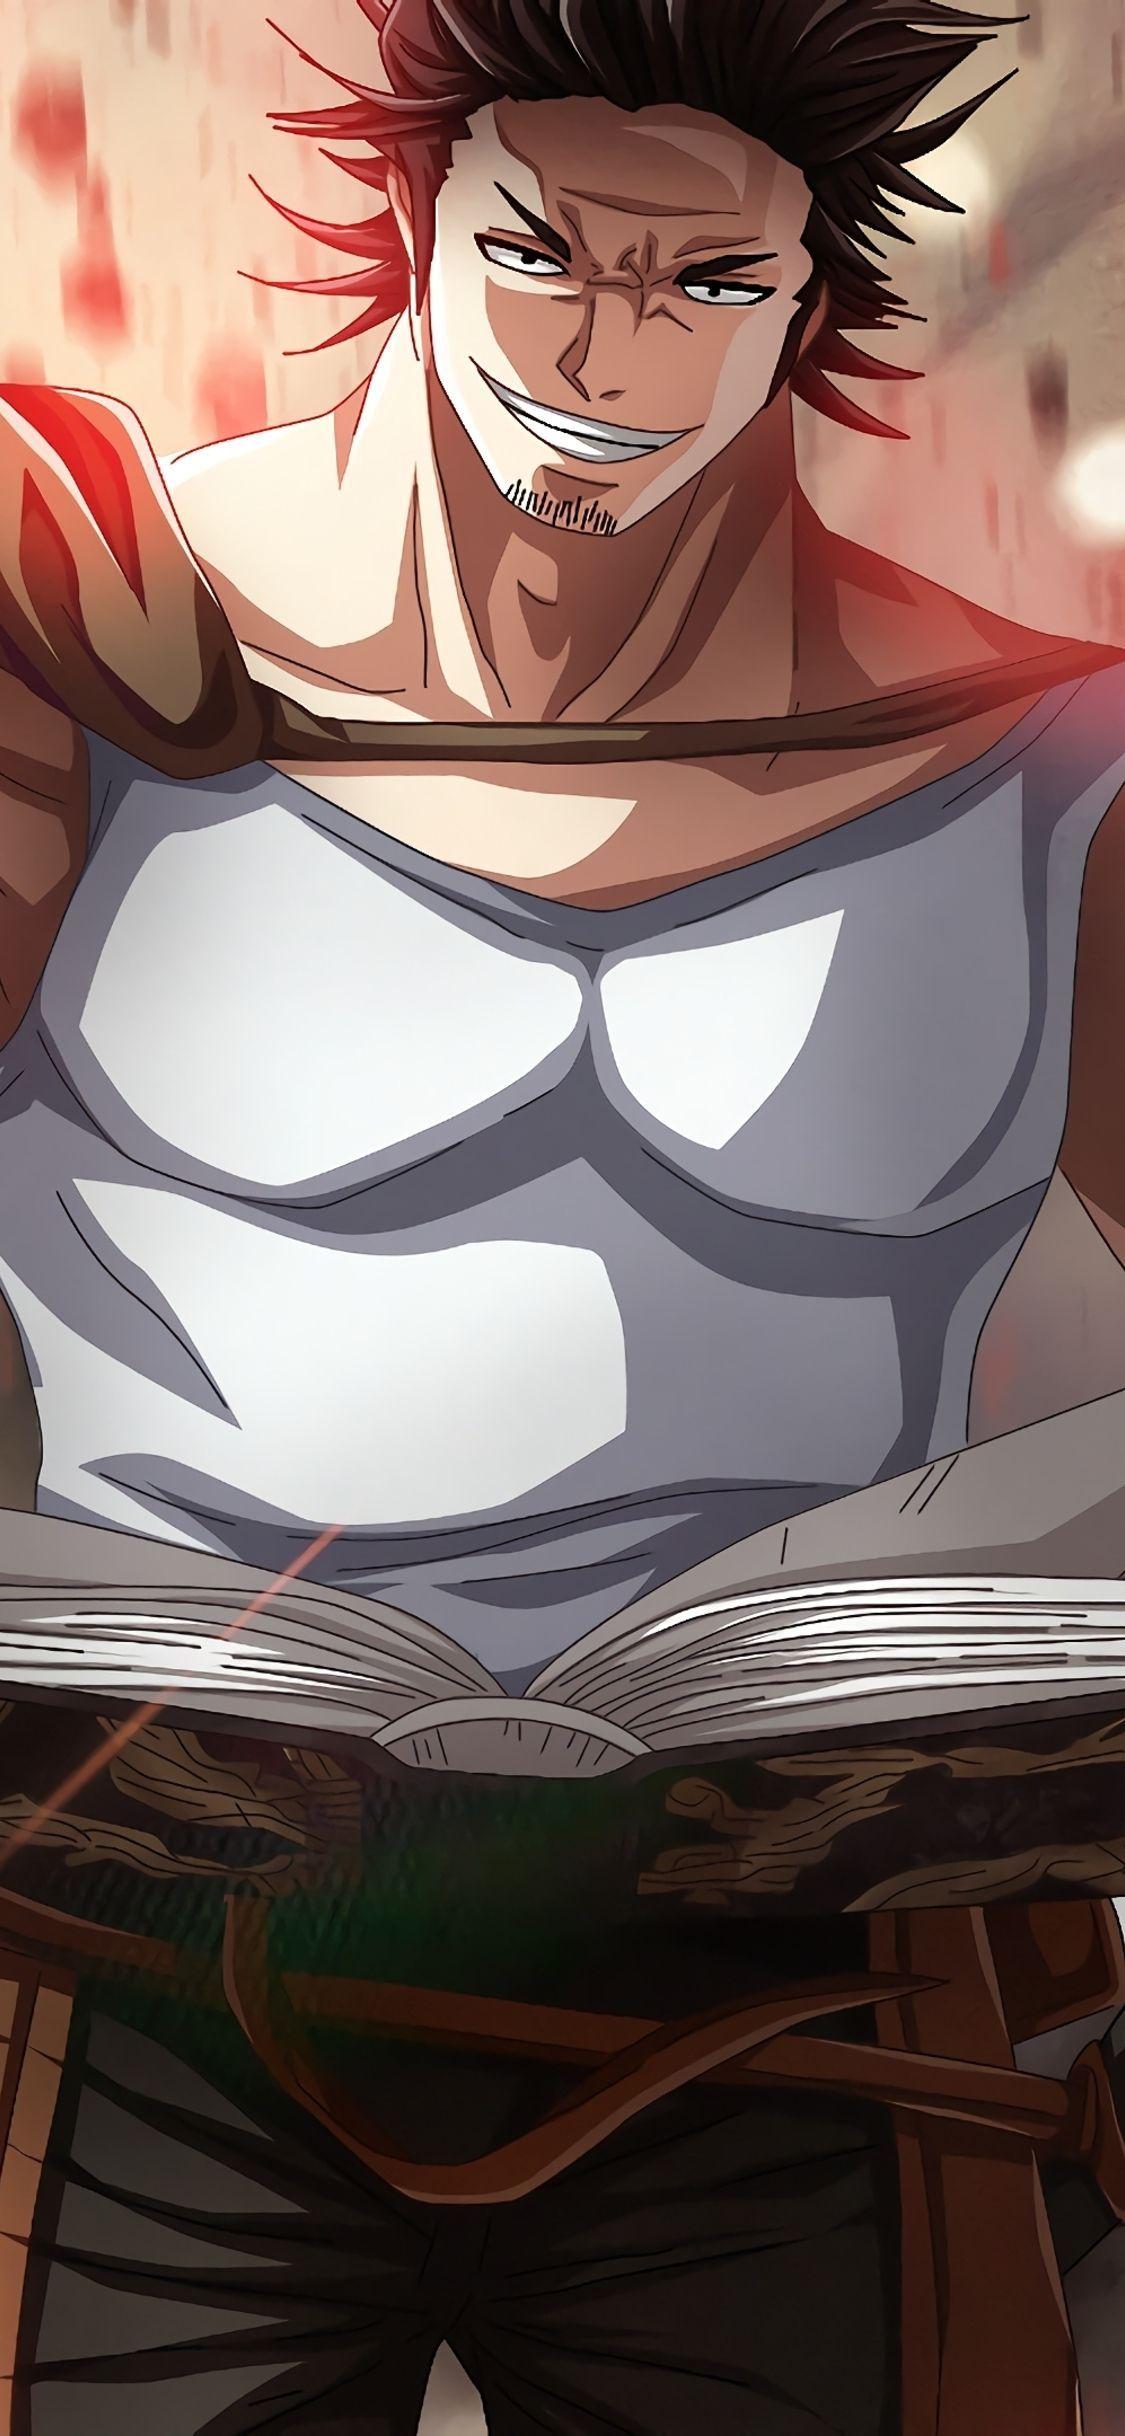 iphonex Black clover anime, Anime wallpaper, Hd anime